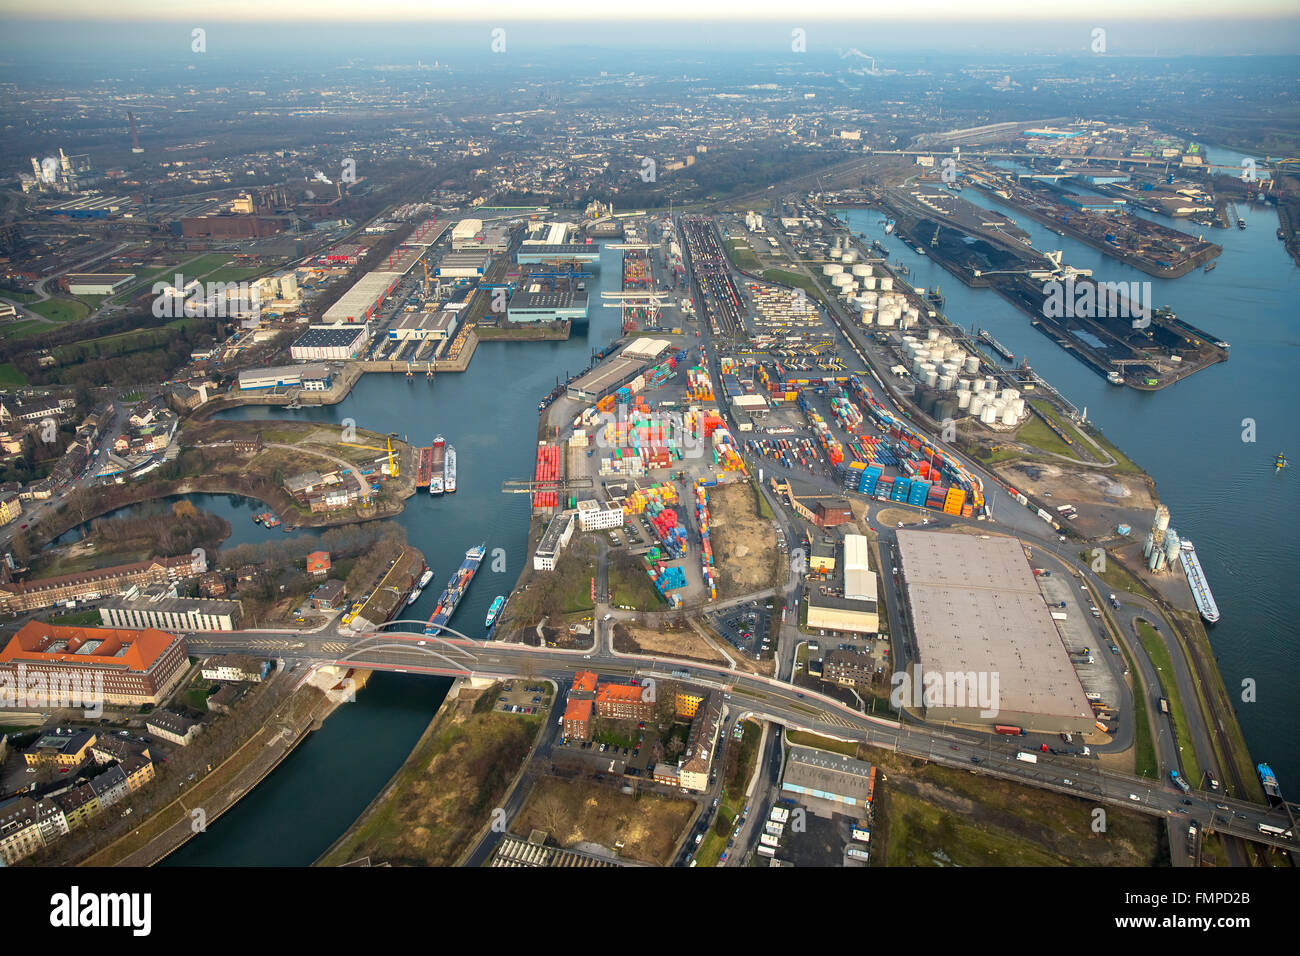 Duisburg harbor, bridge over Vinckekanal canal, inland water transport, Duisburg, Ruhr district, North Rhine-Westphalia, - Stock Image